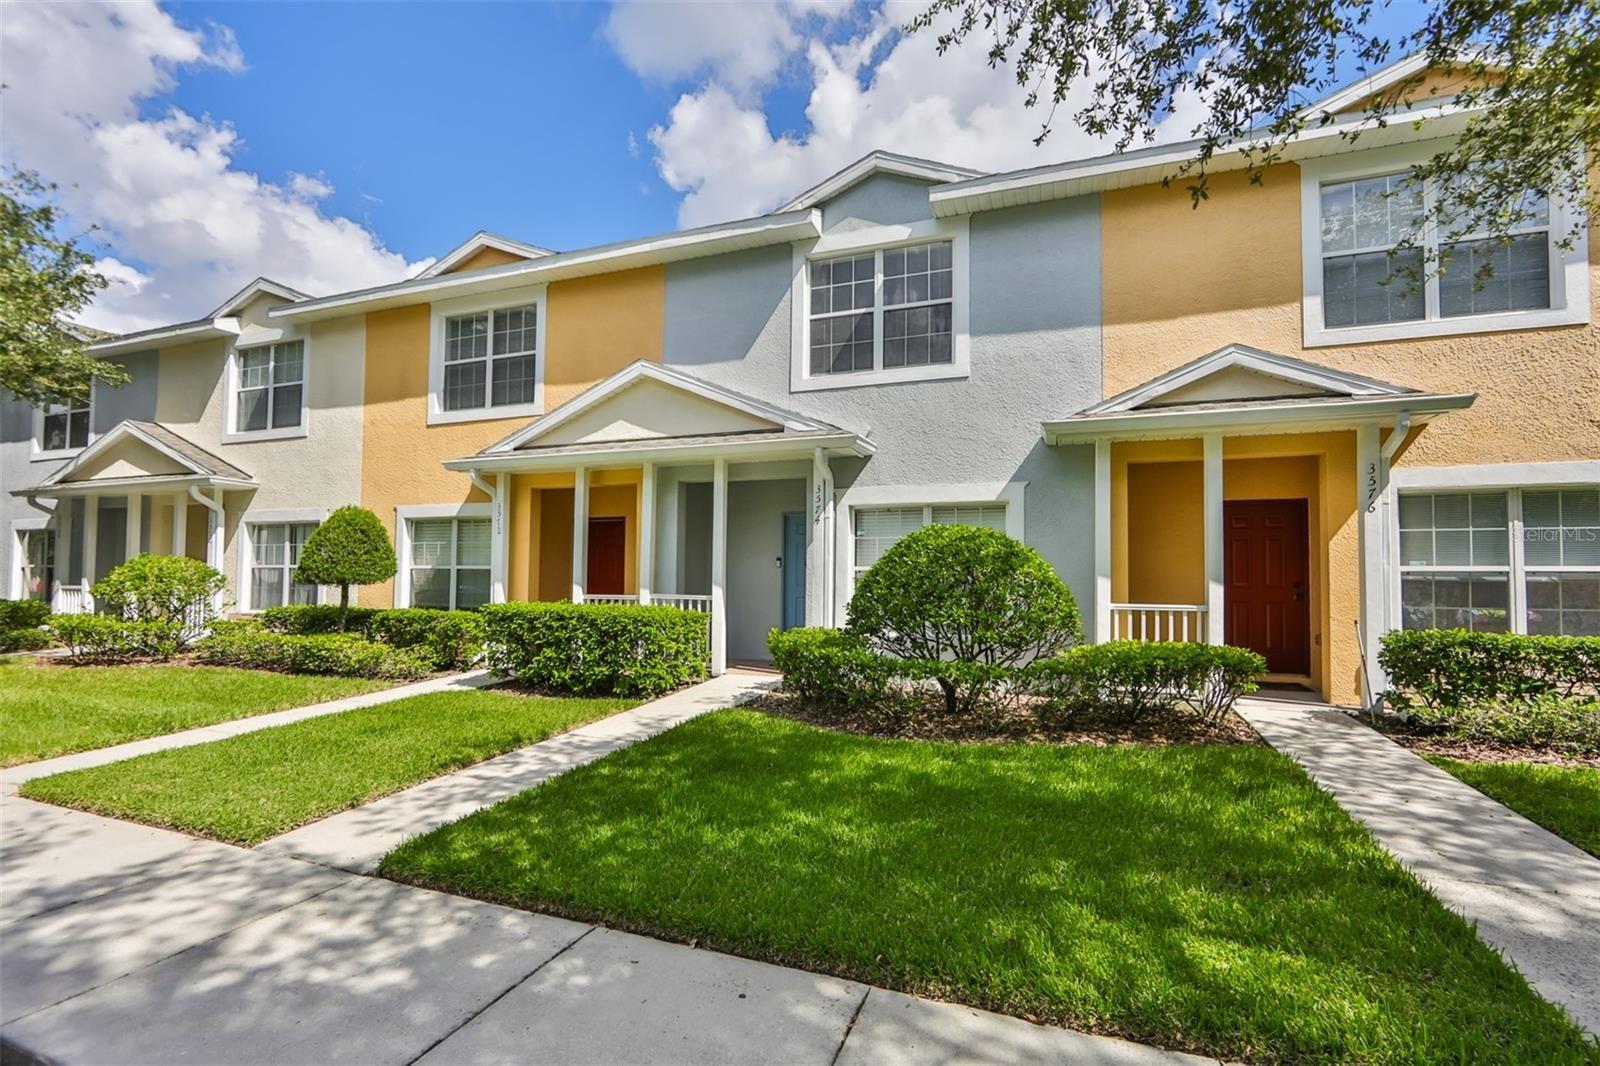 3574 HIGH HAMPTON CIRCLE, Tampa, FL 33610 - #: T3335374